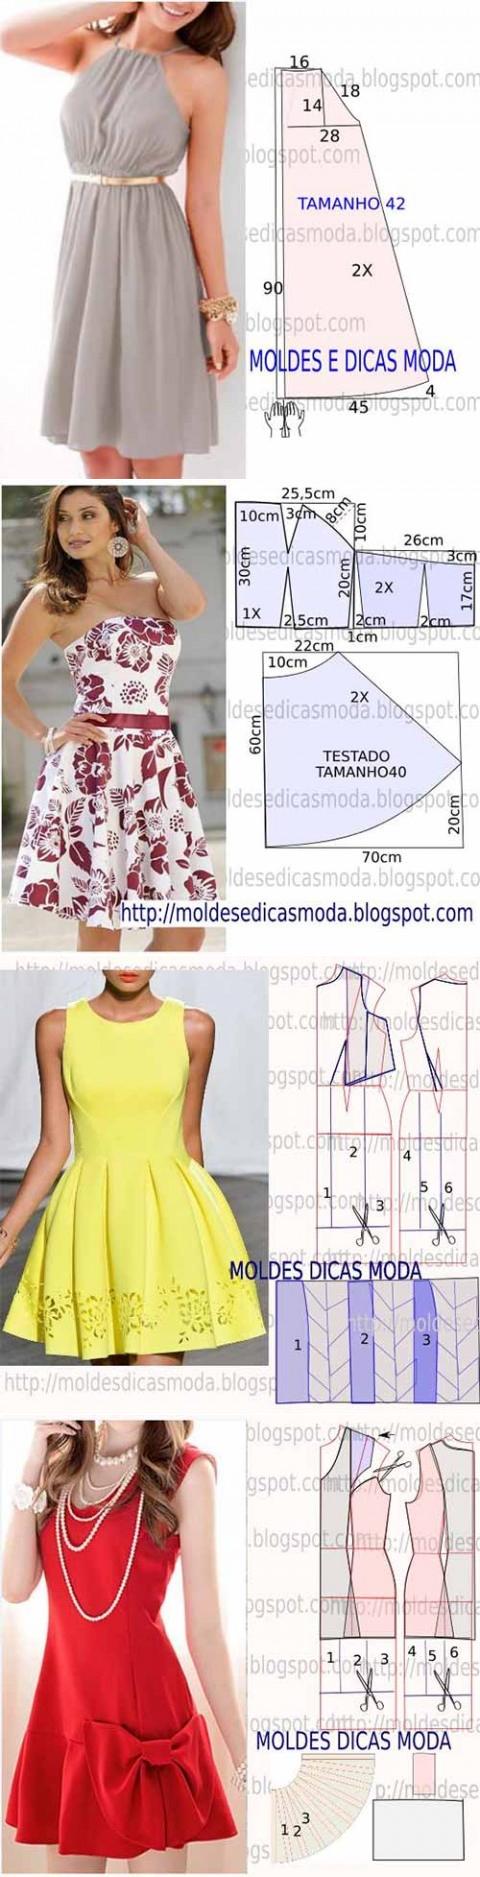 Iskusnitsatm moda pinterest patterns sewing patterns and